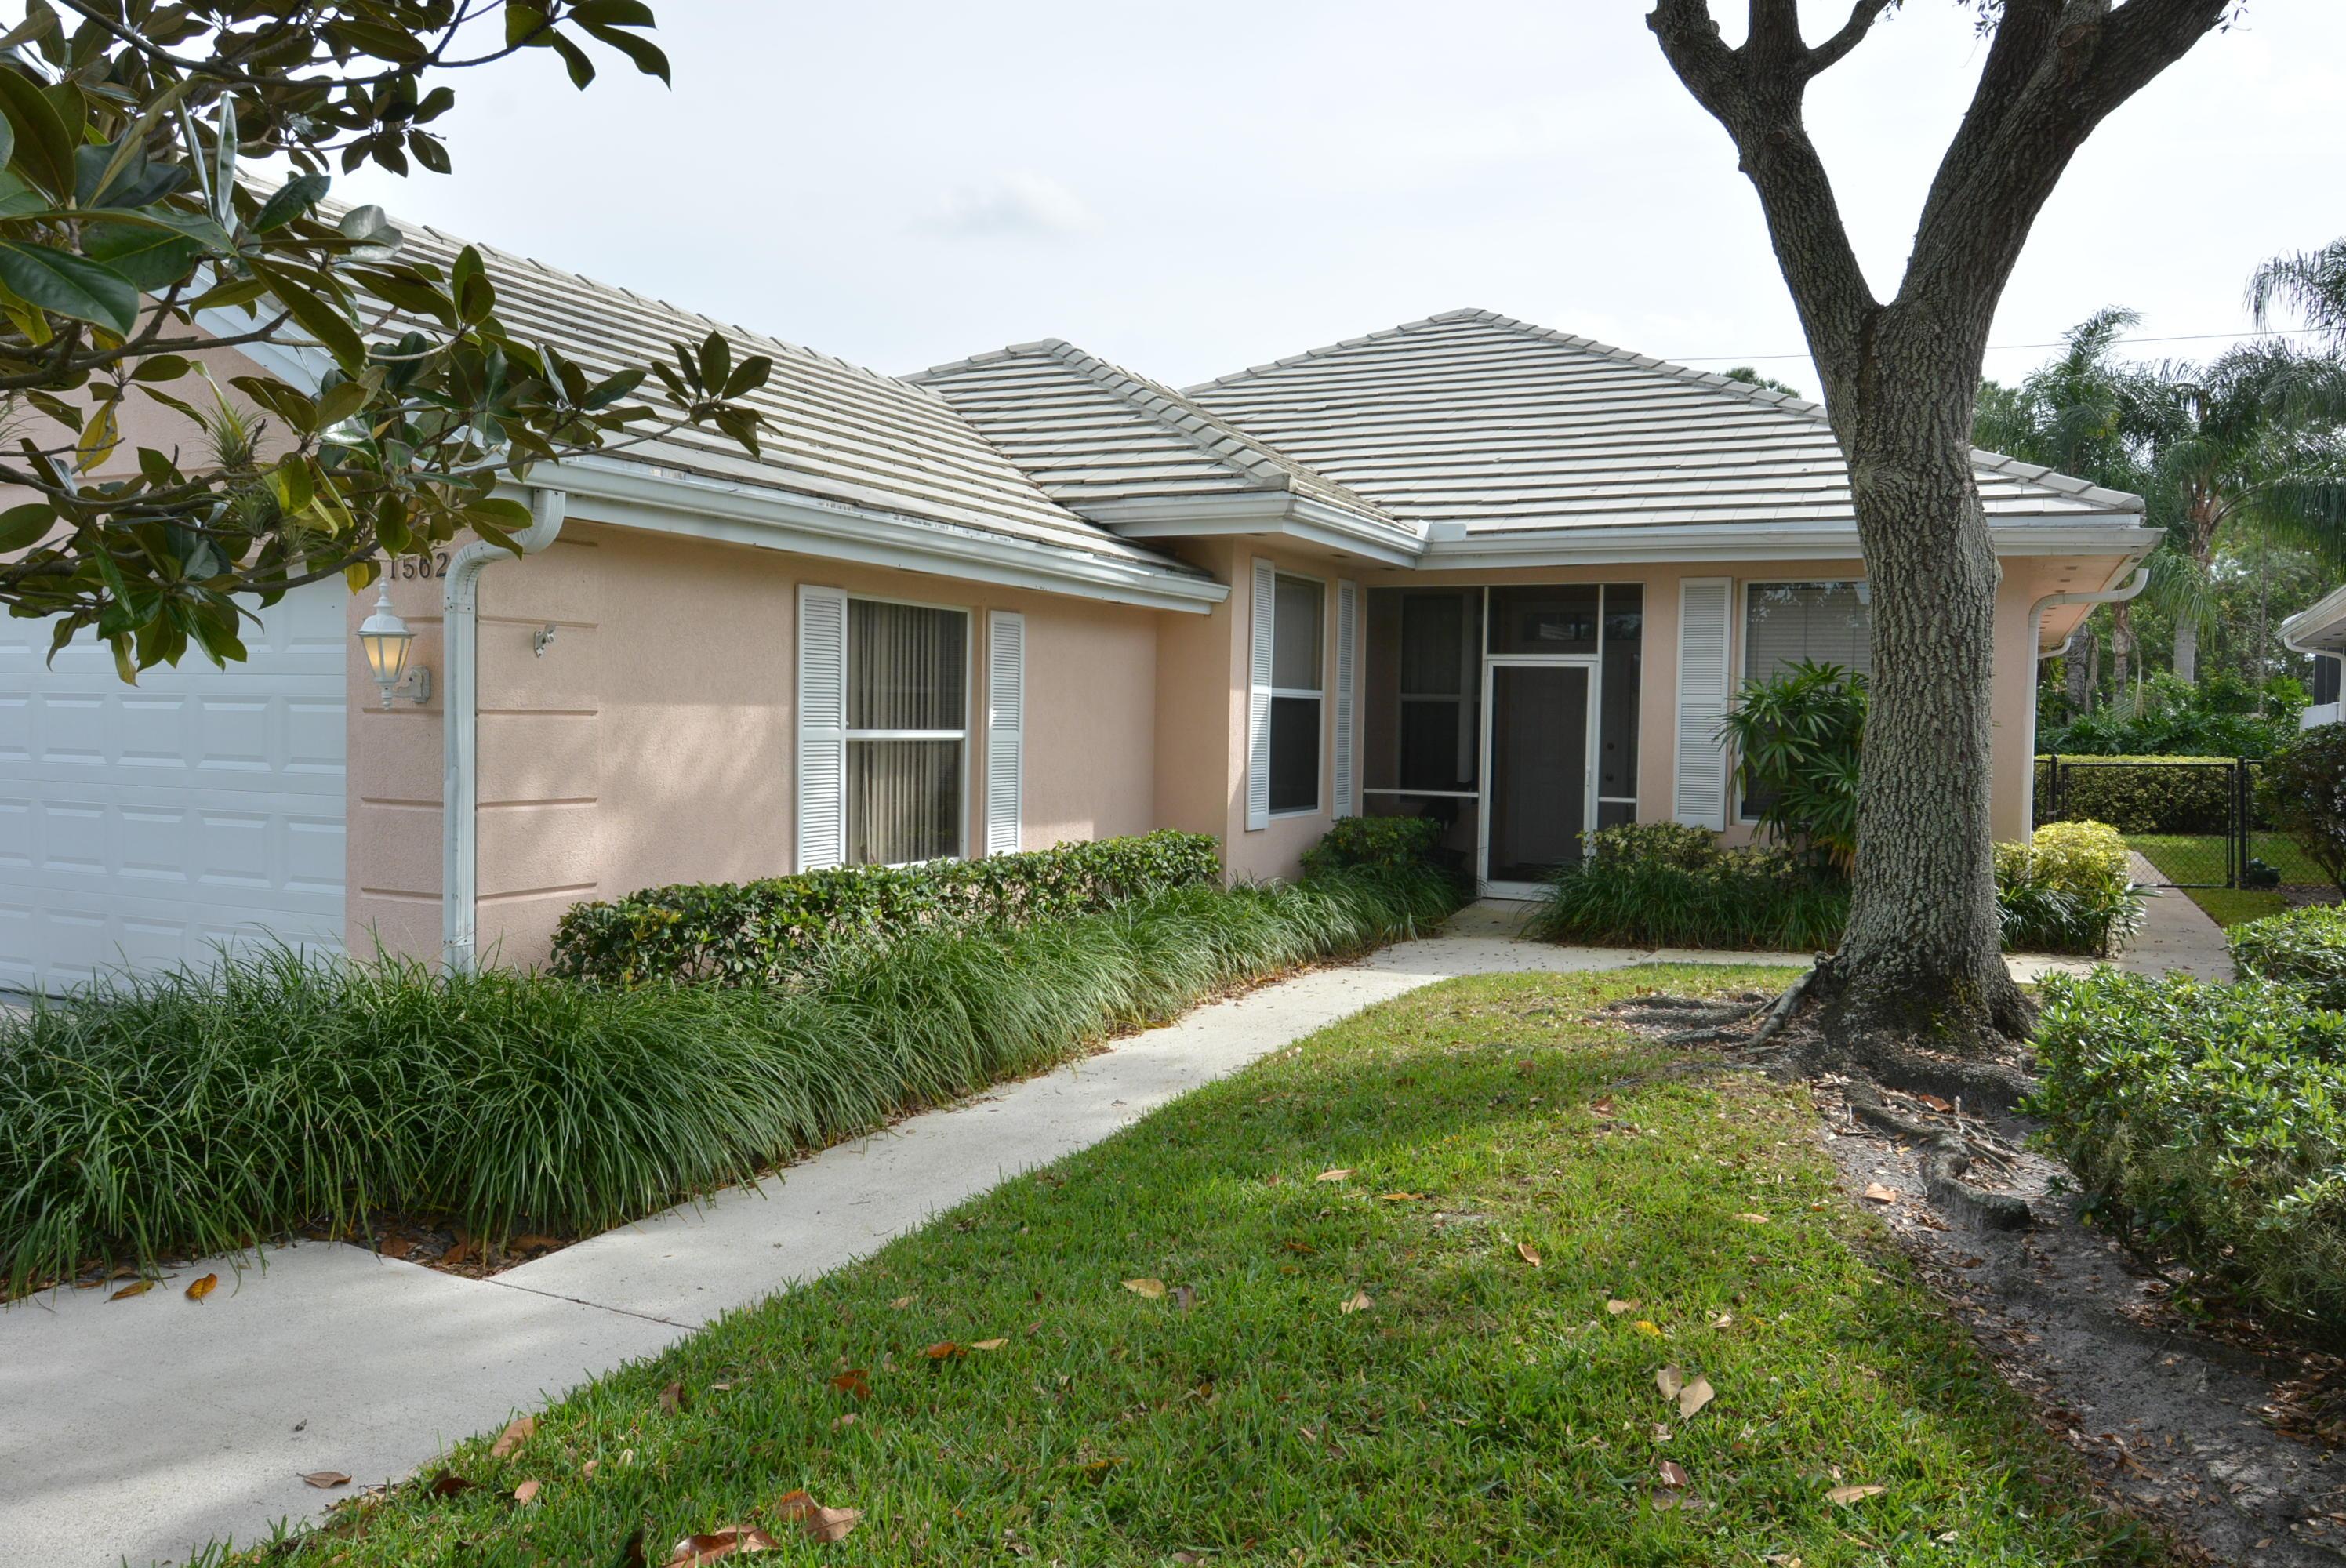 1562 Nw Amherst Drive, Saint Lucie West, FL 34986